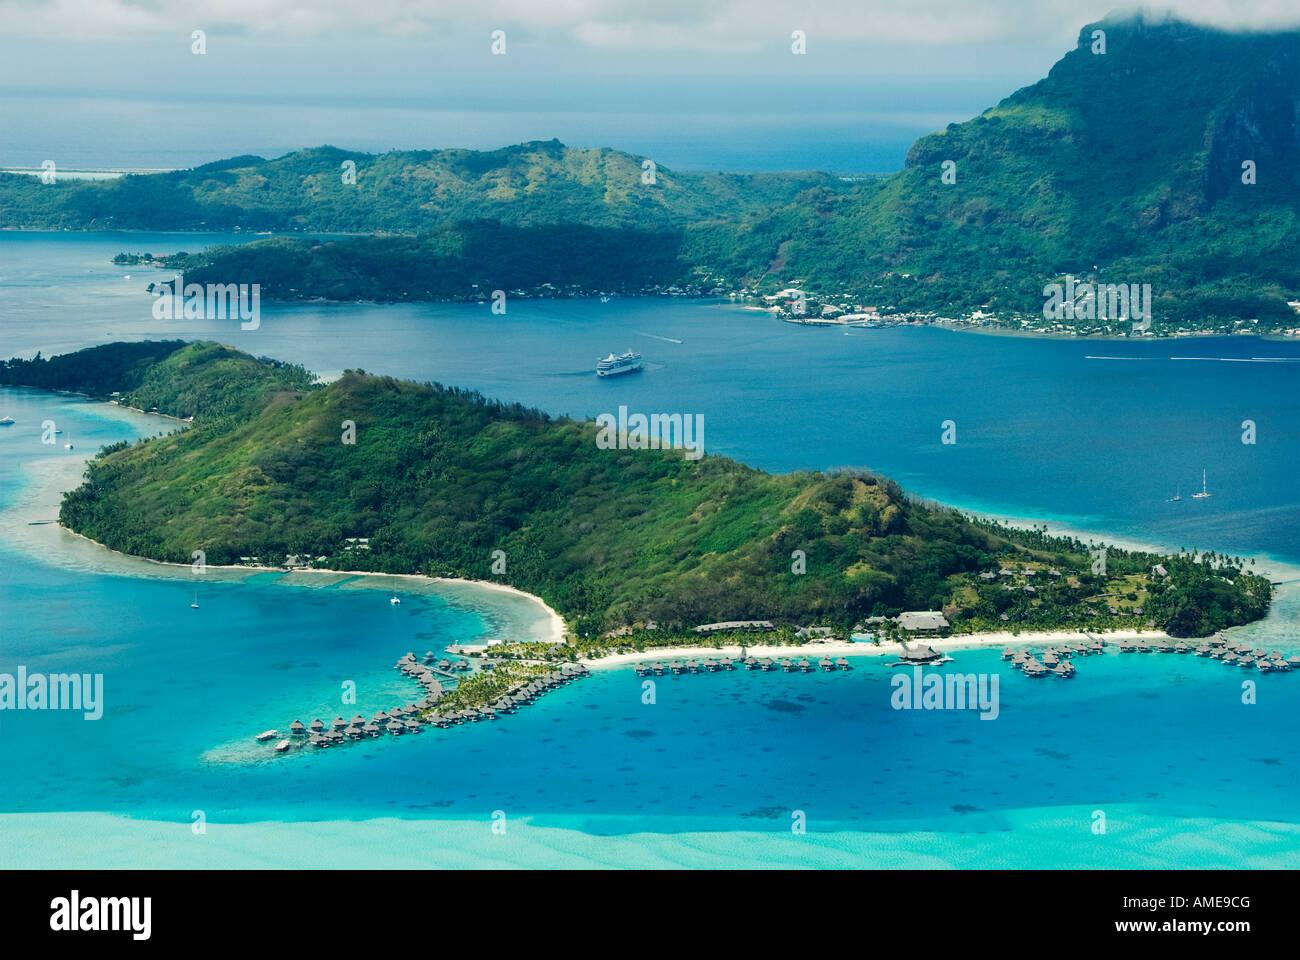 Image Result For Hotel Four Seasons Bora Bora Fresh Four Seasons Resort Bora Bora French Polynesia